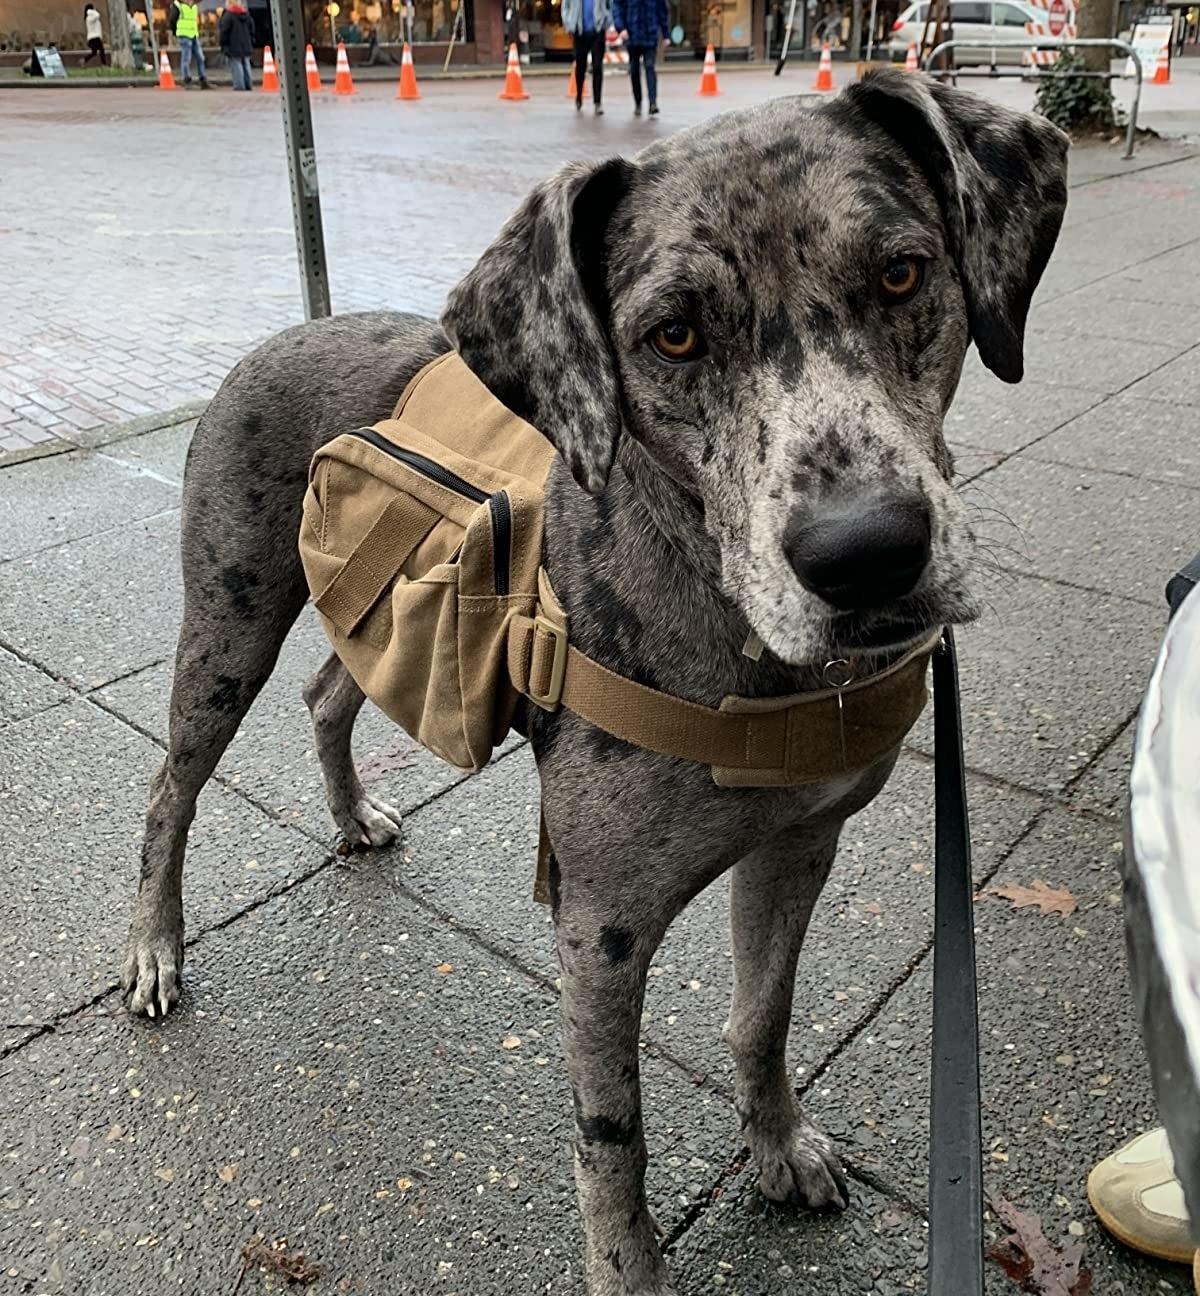 dog on sidewalk with backpack